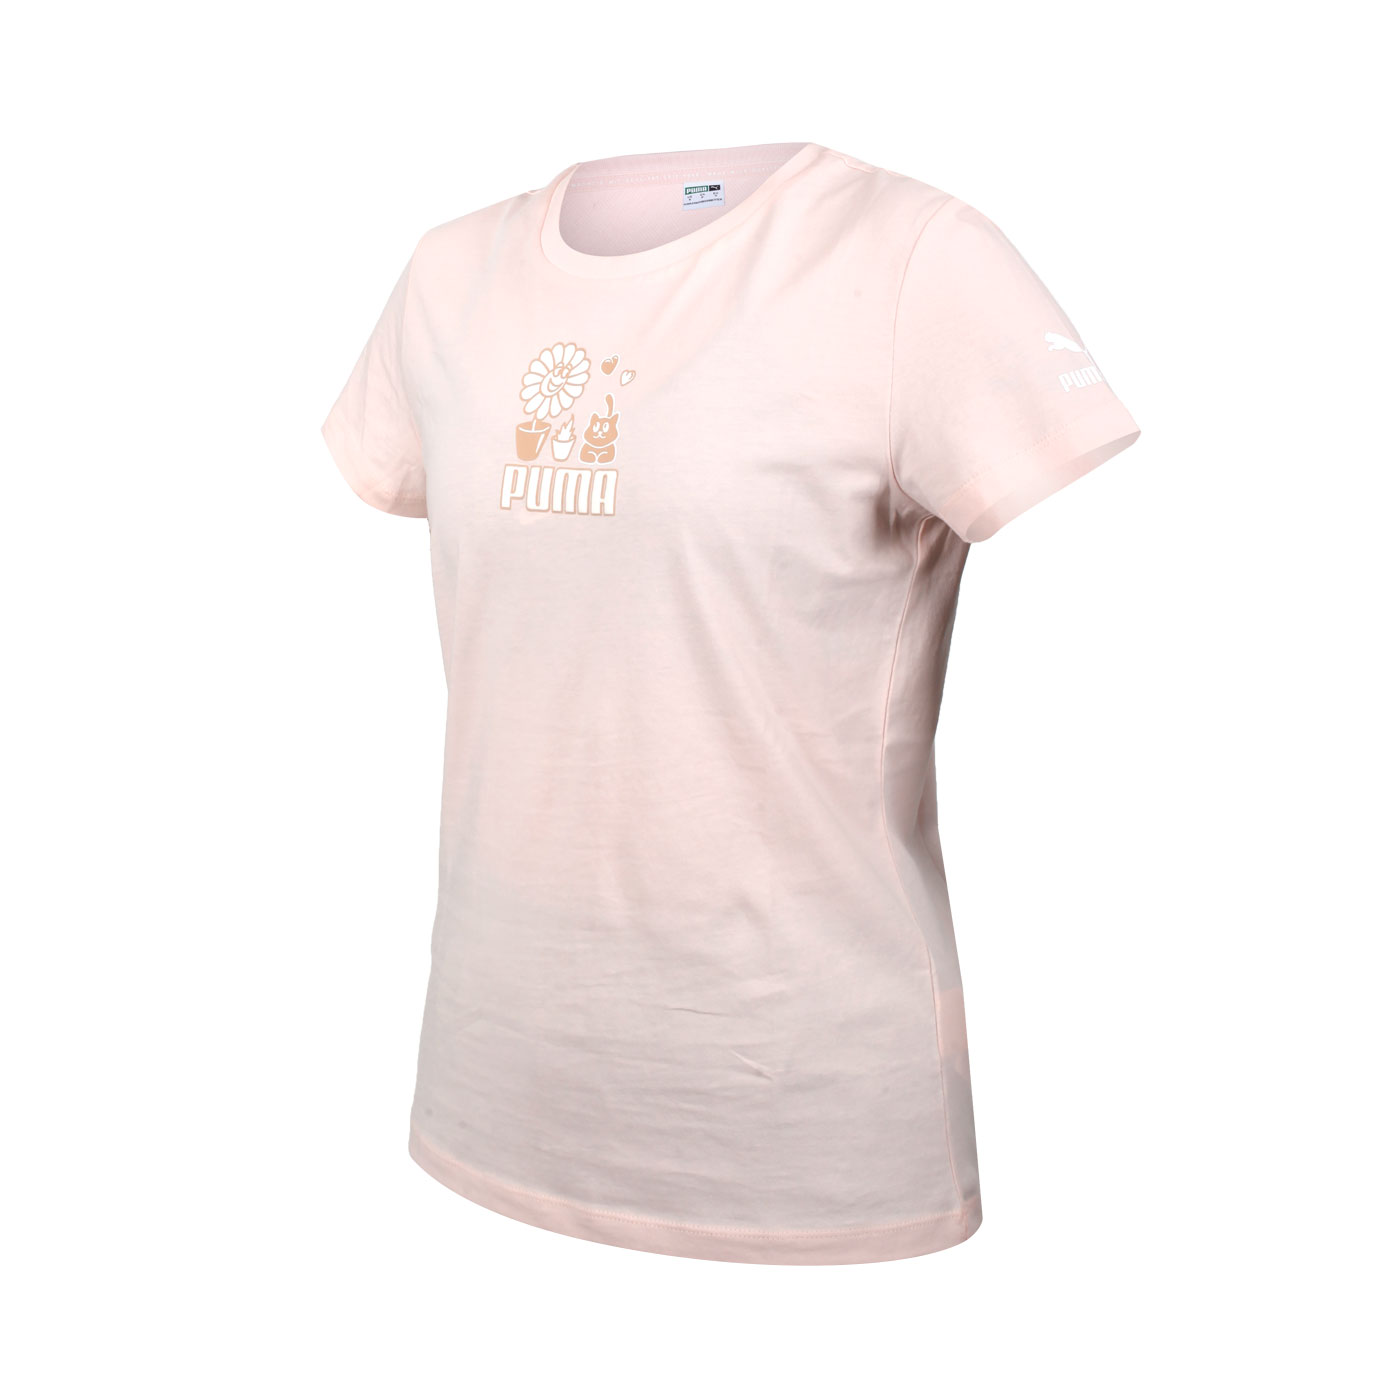 PUMA 女款短袖T恤 53255227 - 粉橘白